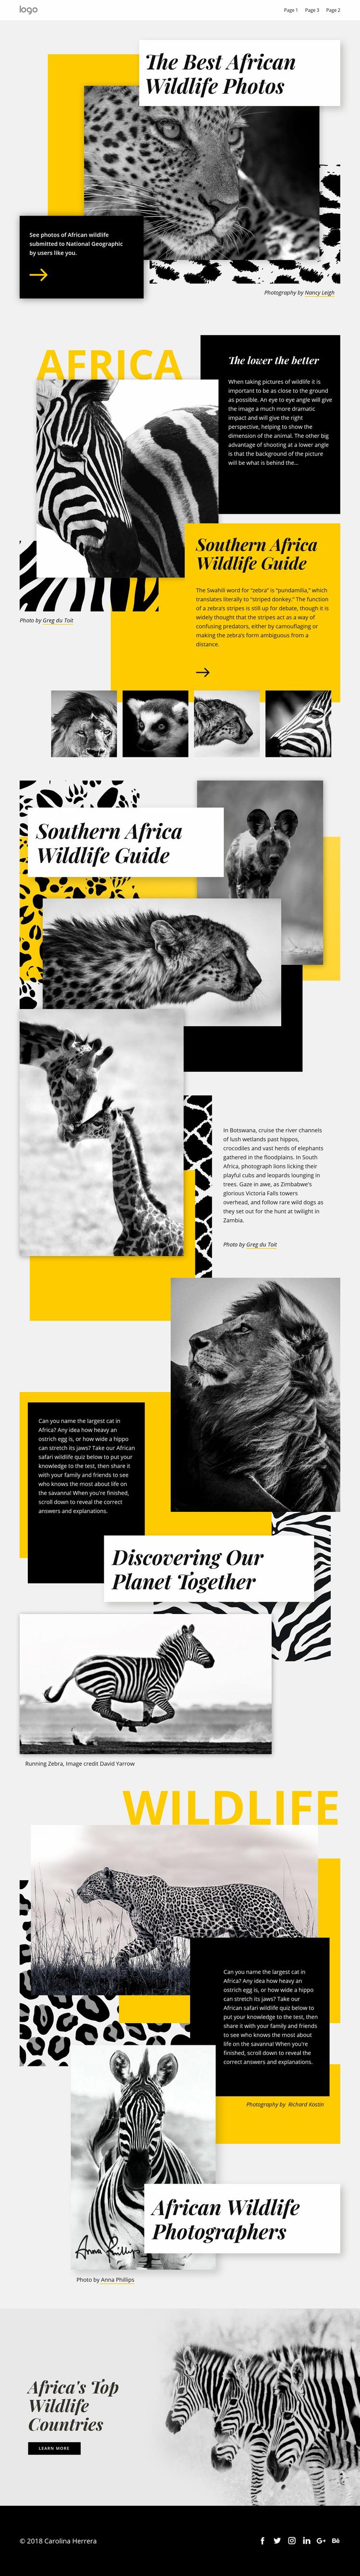 Best African Photos Web Page Designer